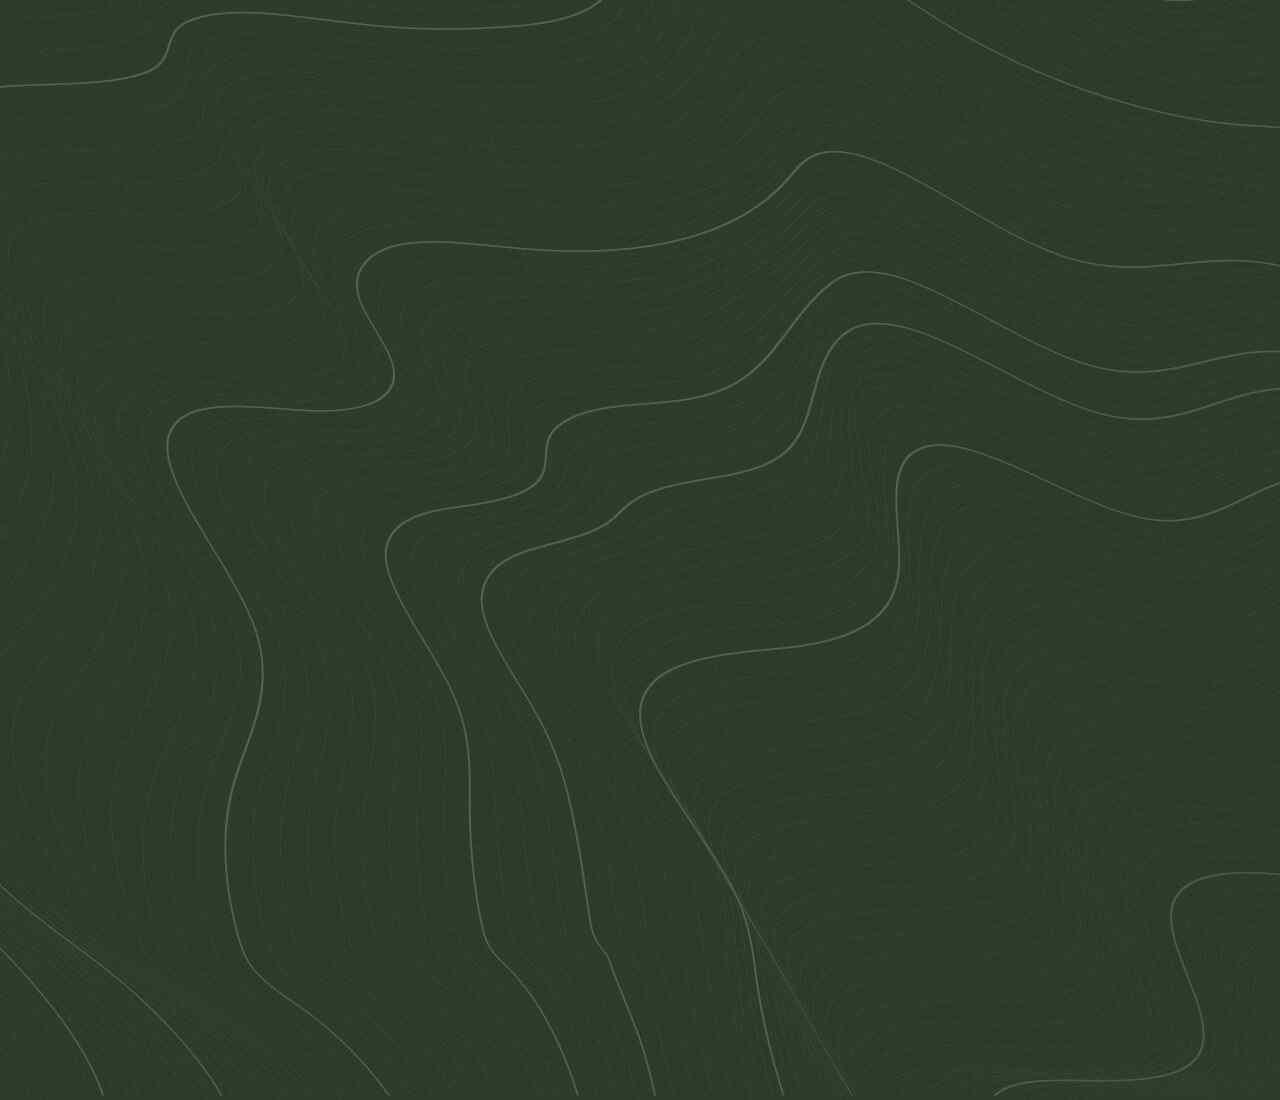 https://albaziegroup.com/wp-content/uploads/2020/02/green-background-1280x1100.jpg